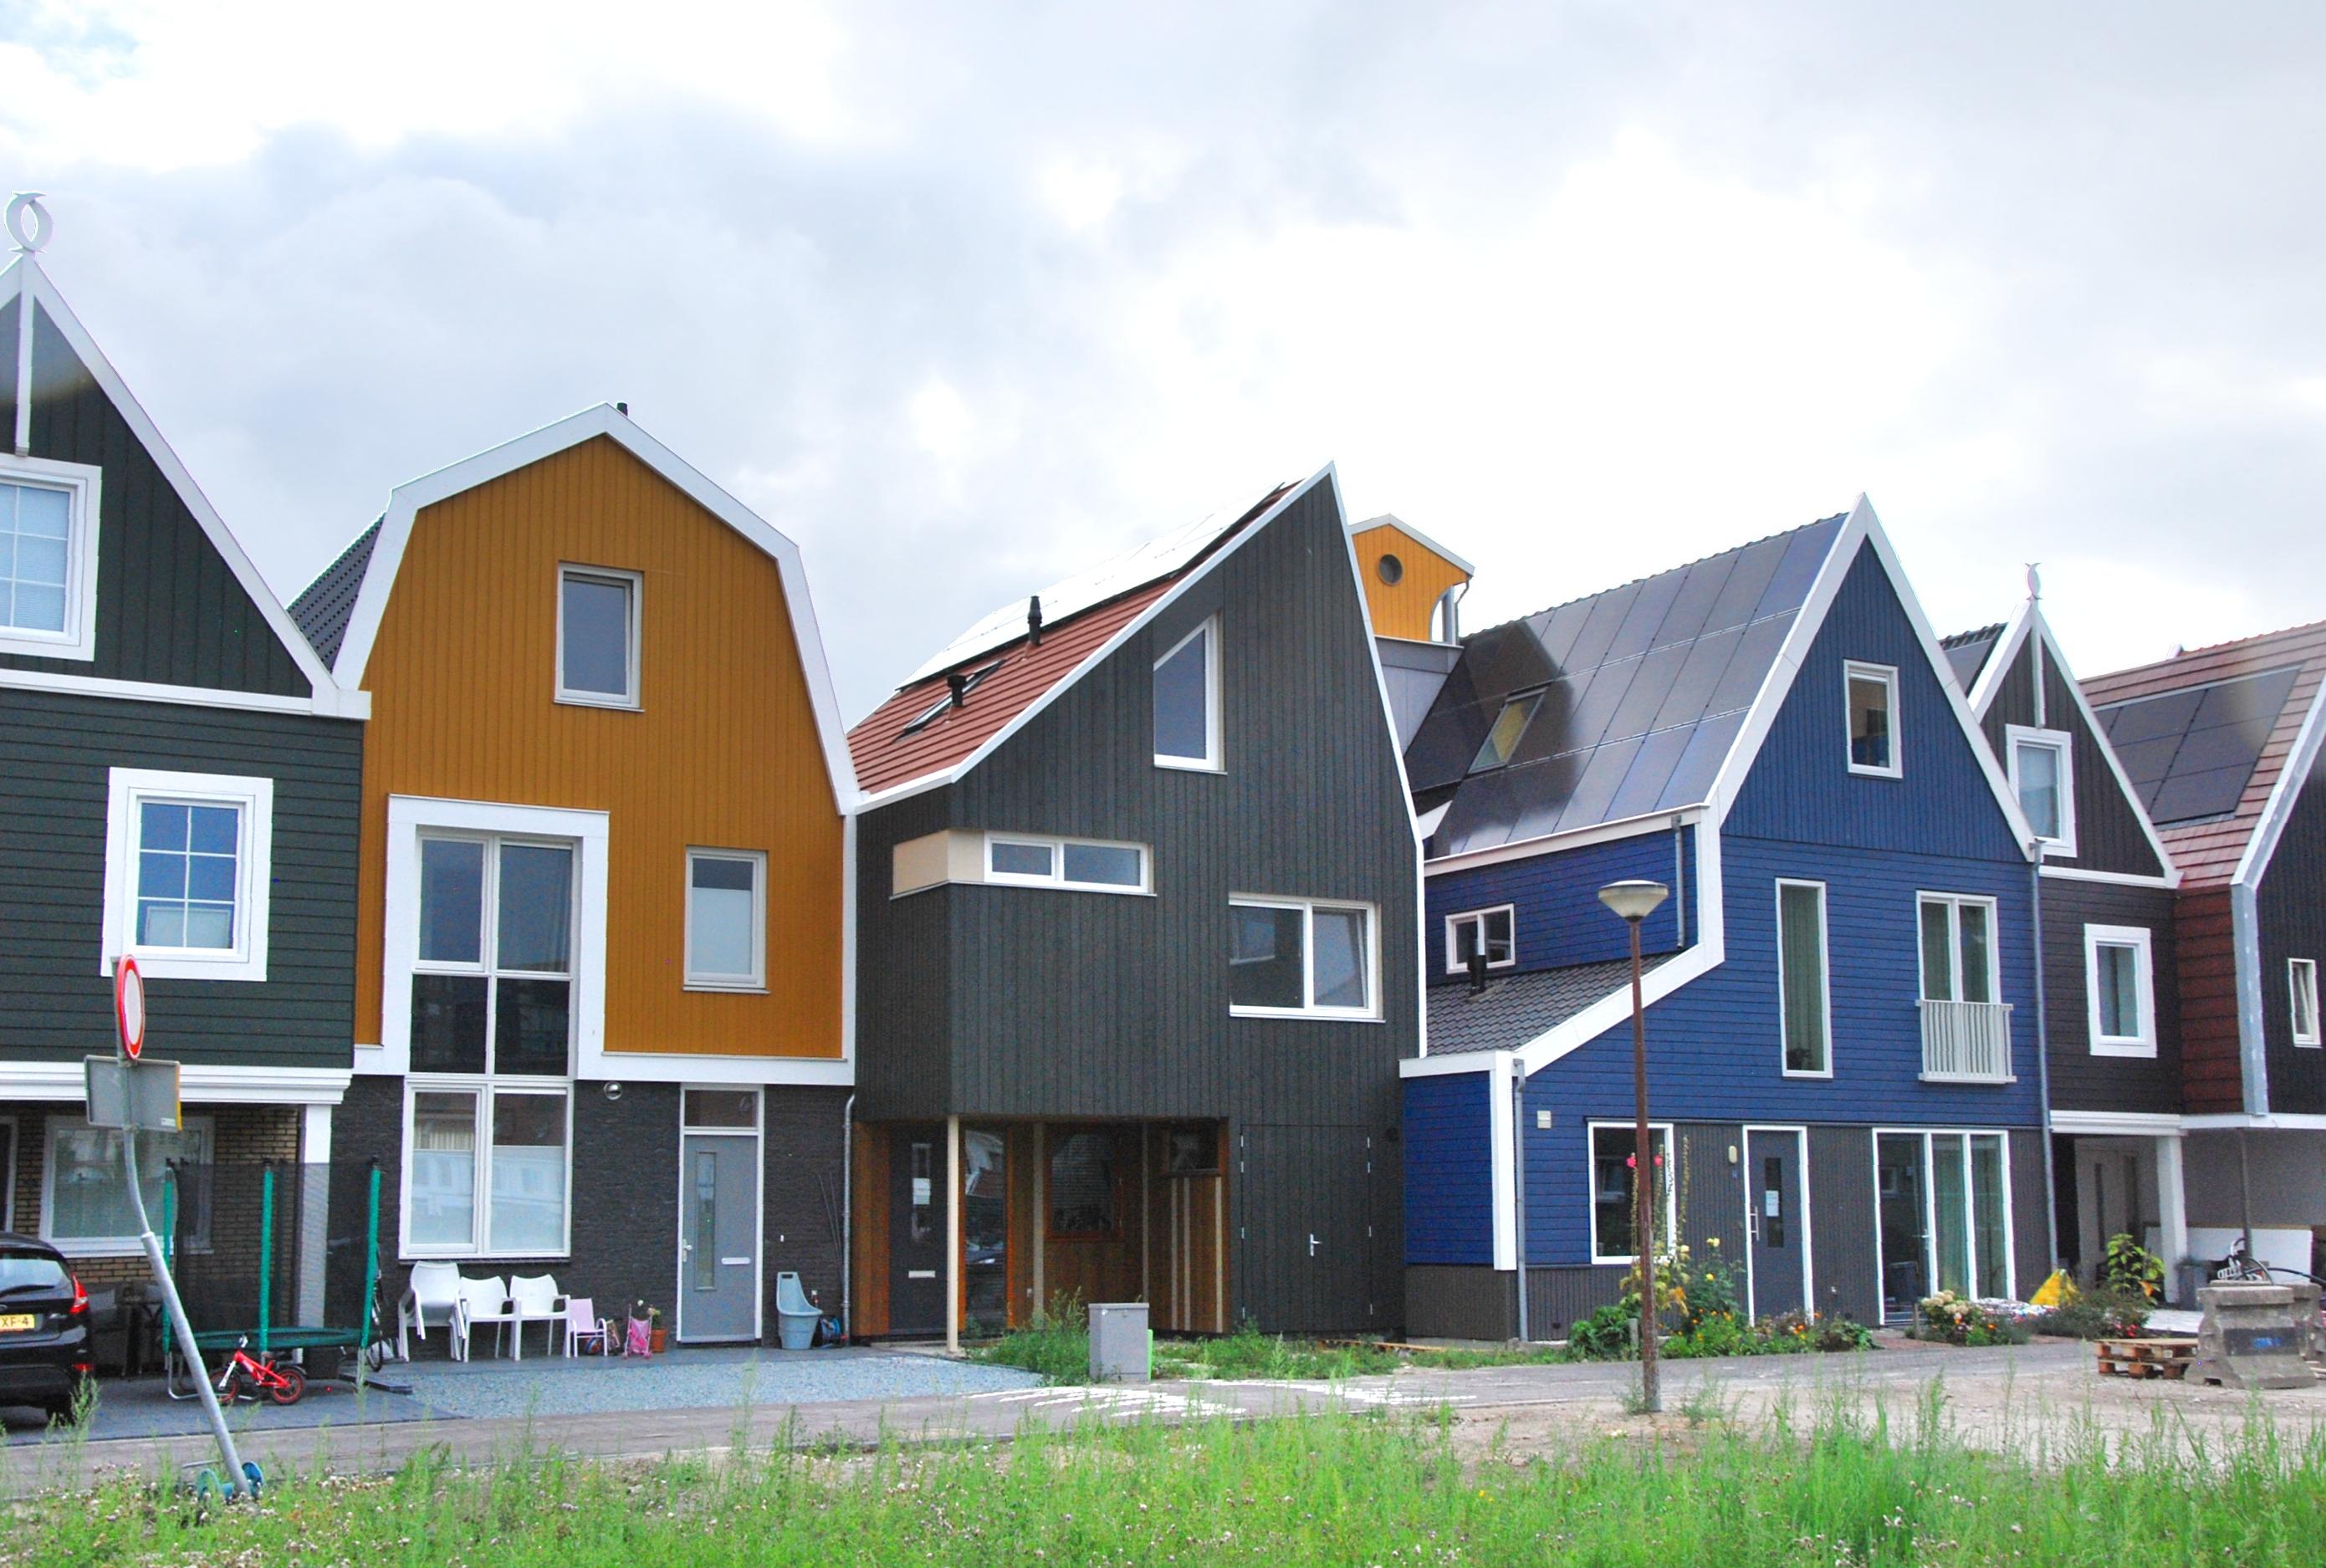 <p>Stedebouwkundige inpassing in het straatbeeld</p>